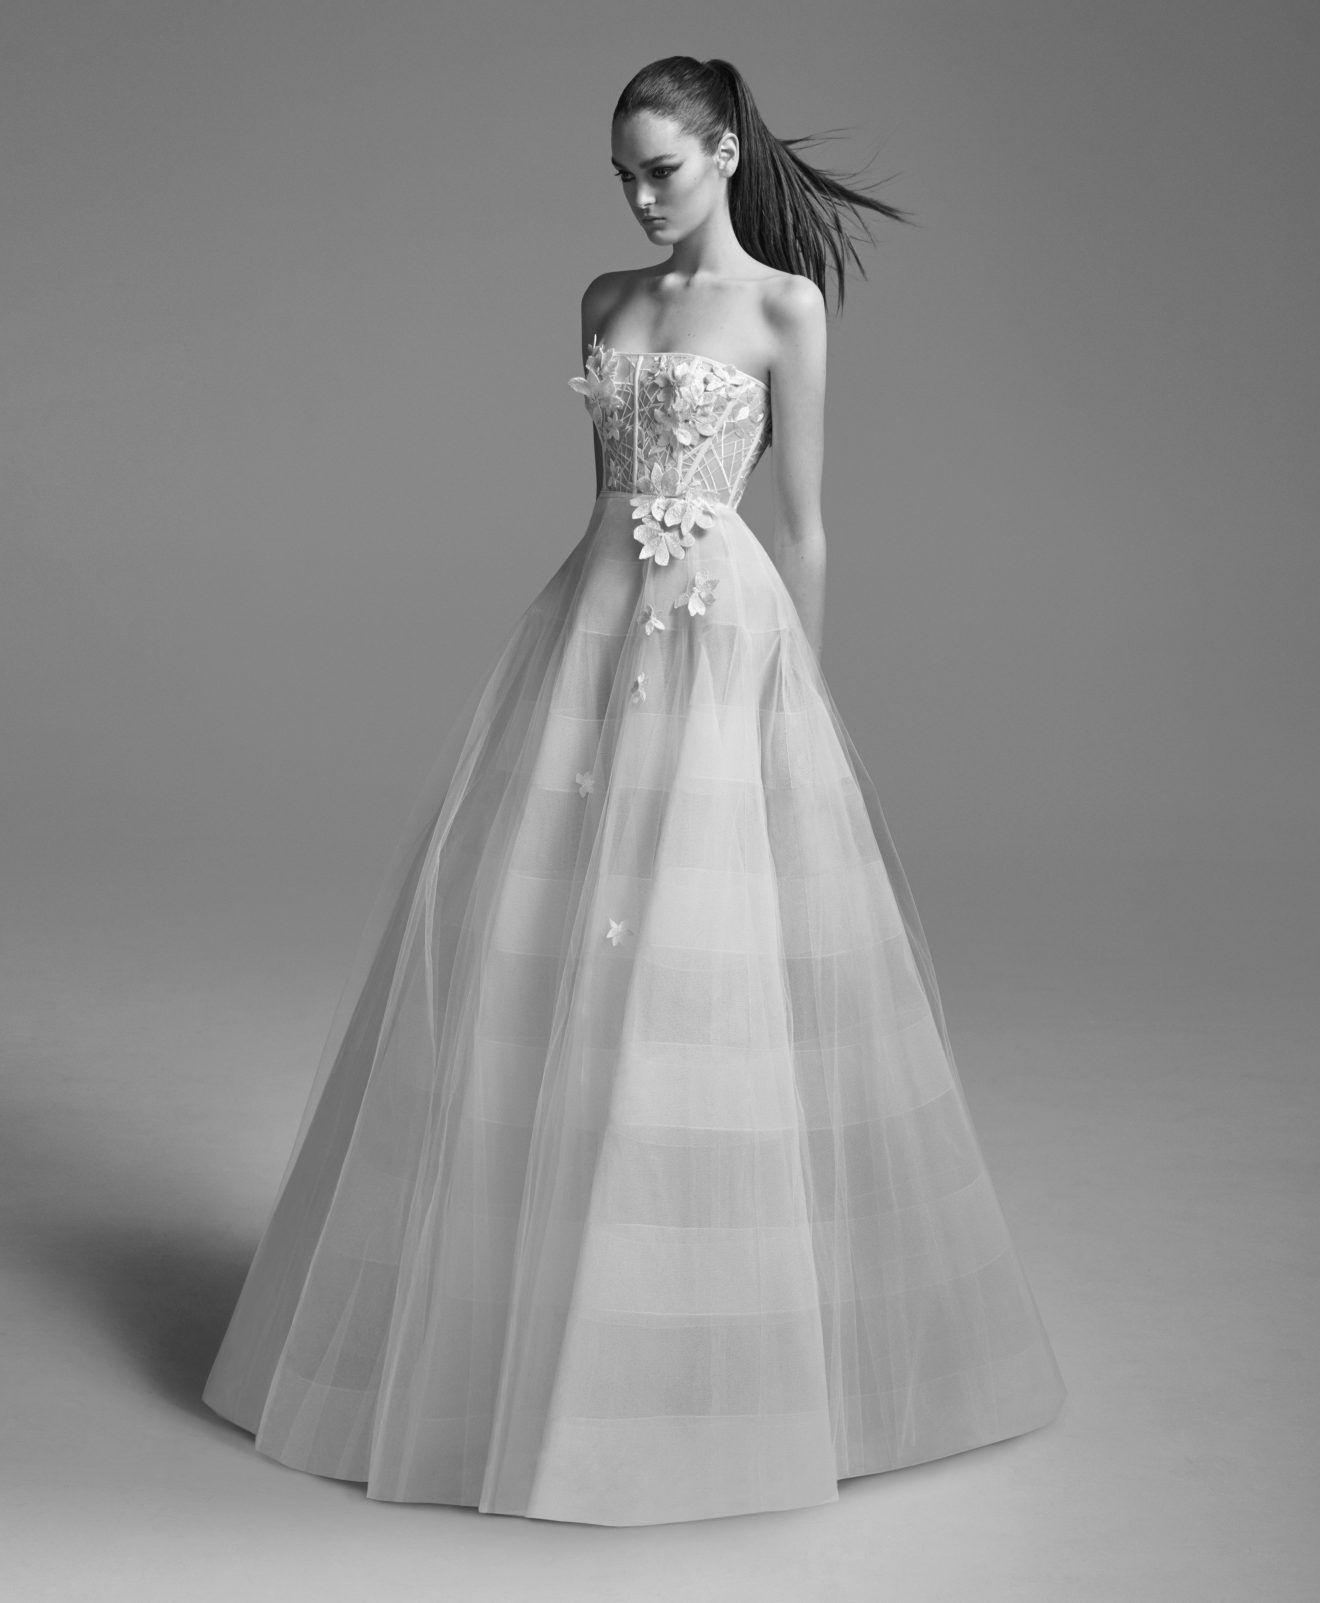 Alex Perry Wedding Gowns: Alex Perry, Wedding Dresses, Wedding Gowns